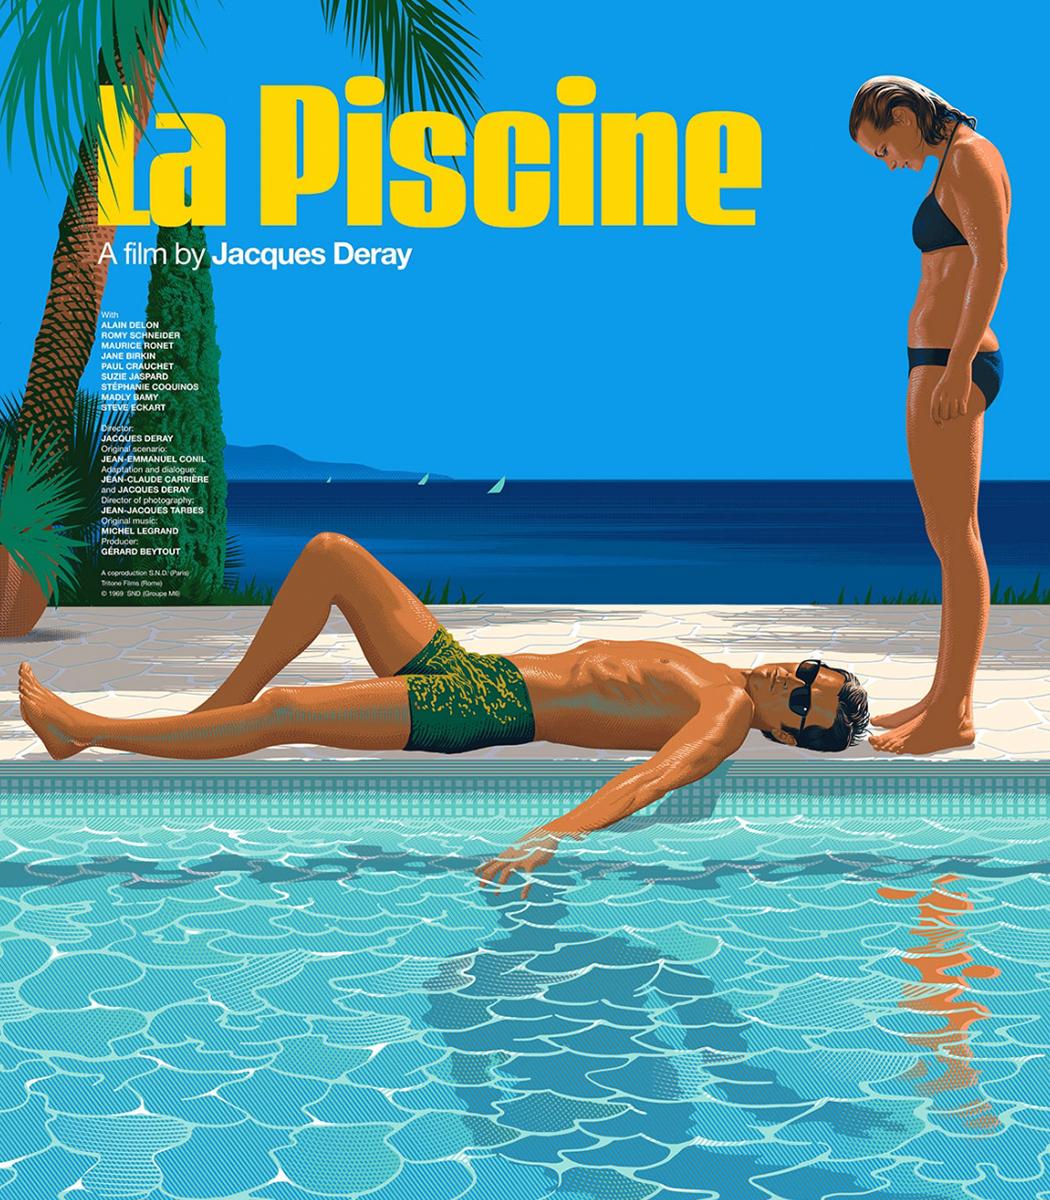 Nuevo póster del filme ilustrado por Laurent Durieux.